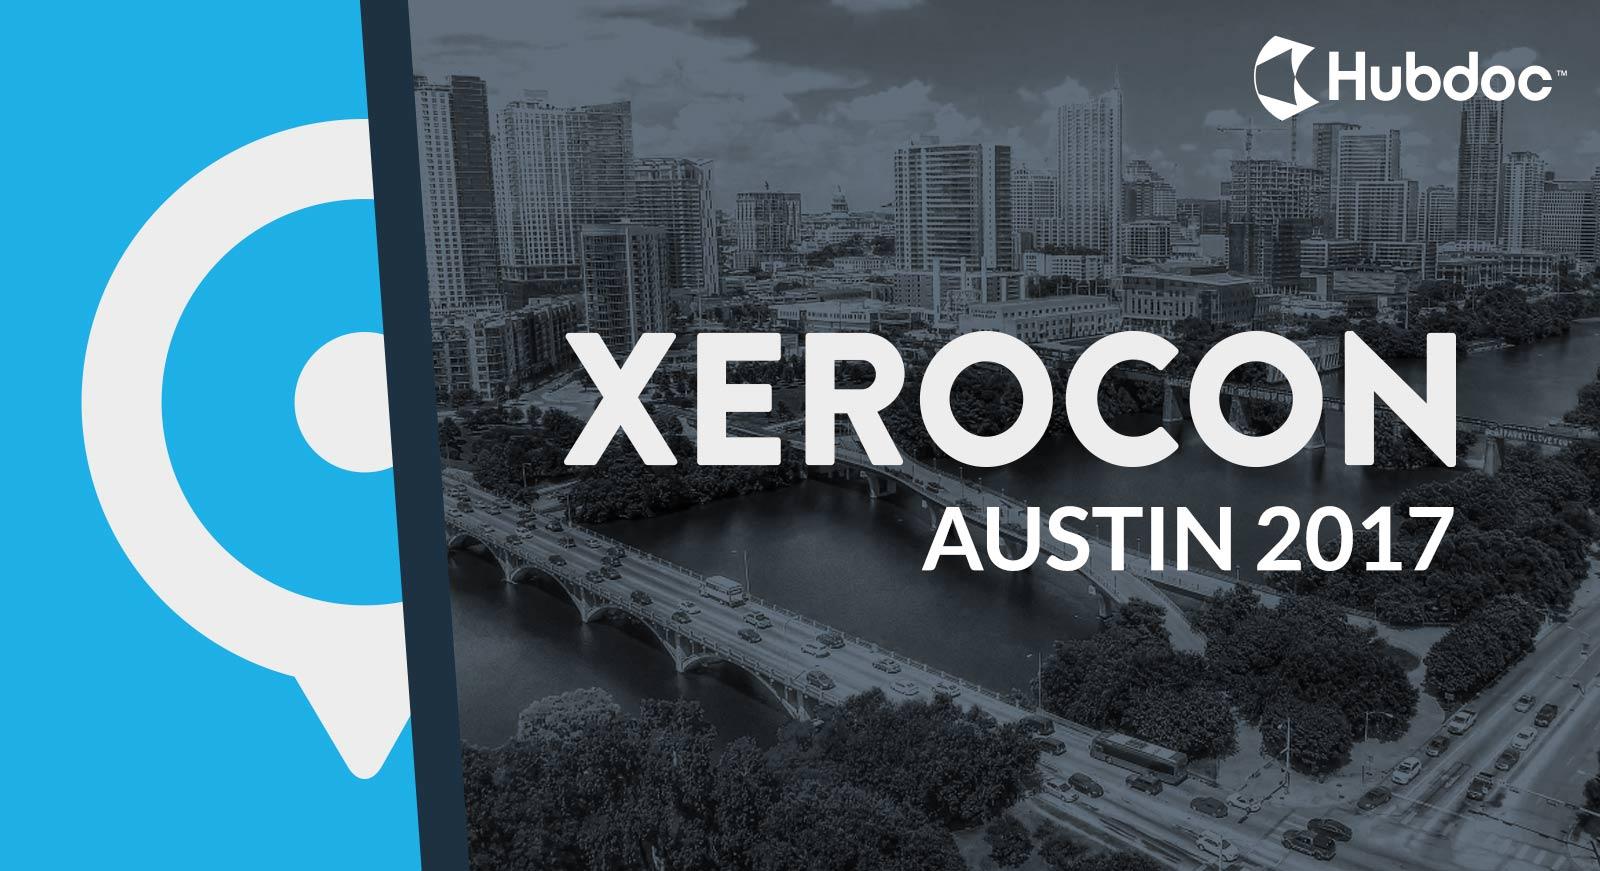 Xerocon Austin